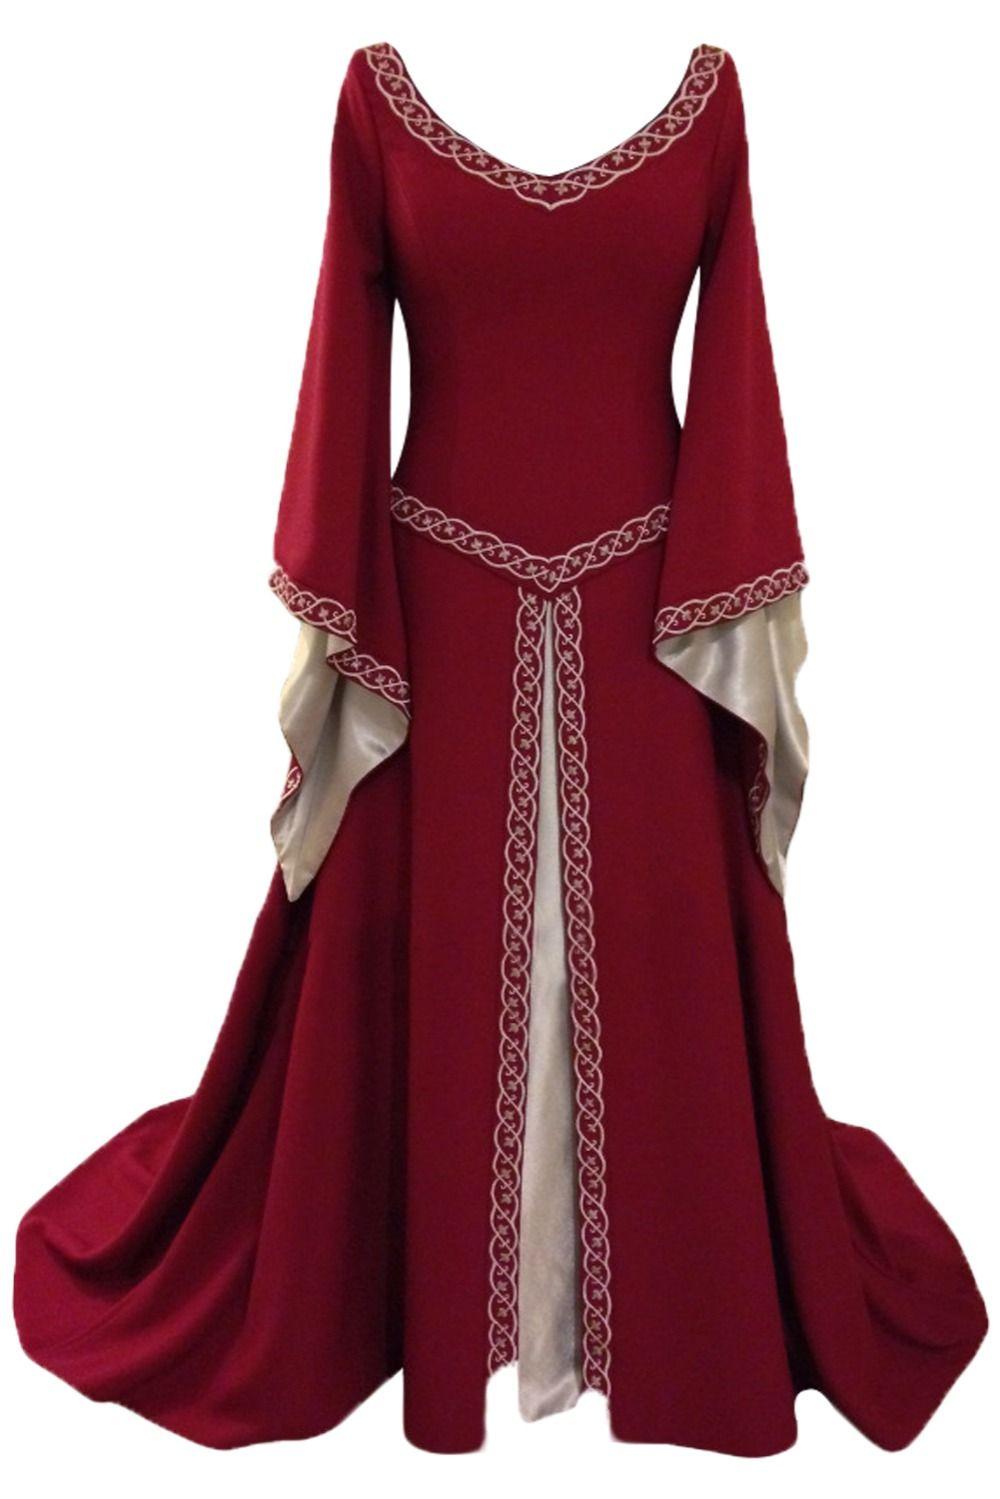 Women Medieval Renaissance Dress Gown Bell Sleeve V-neck Halloween Costume New